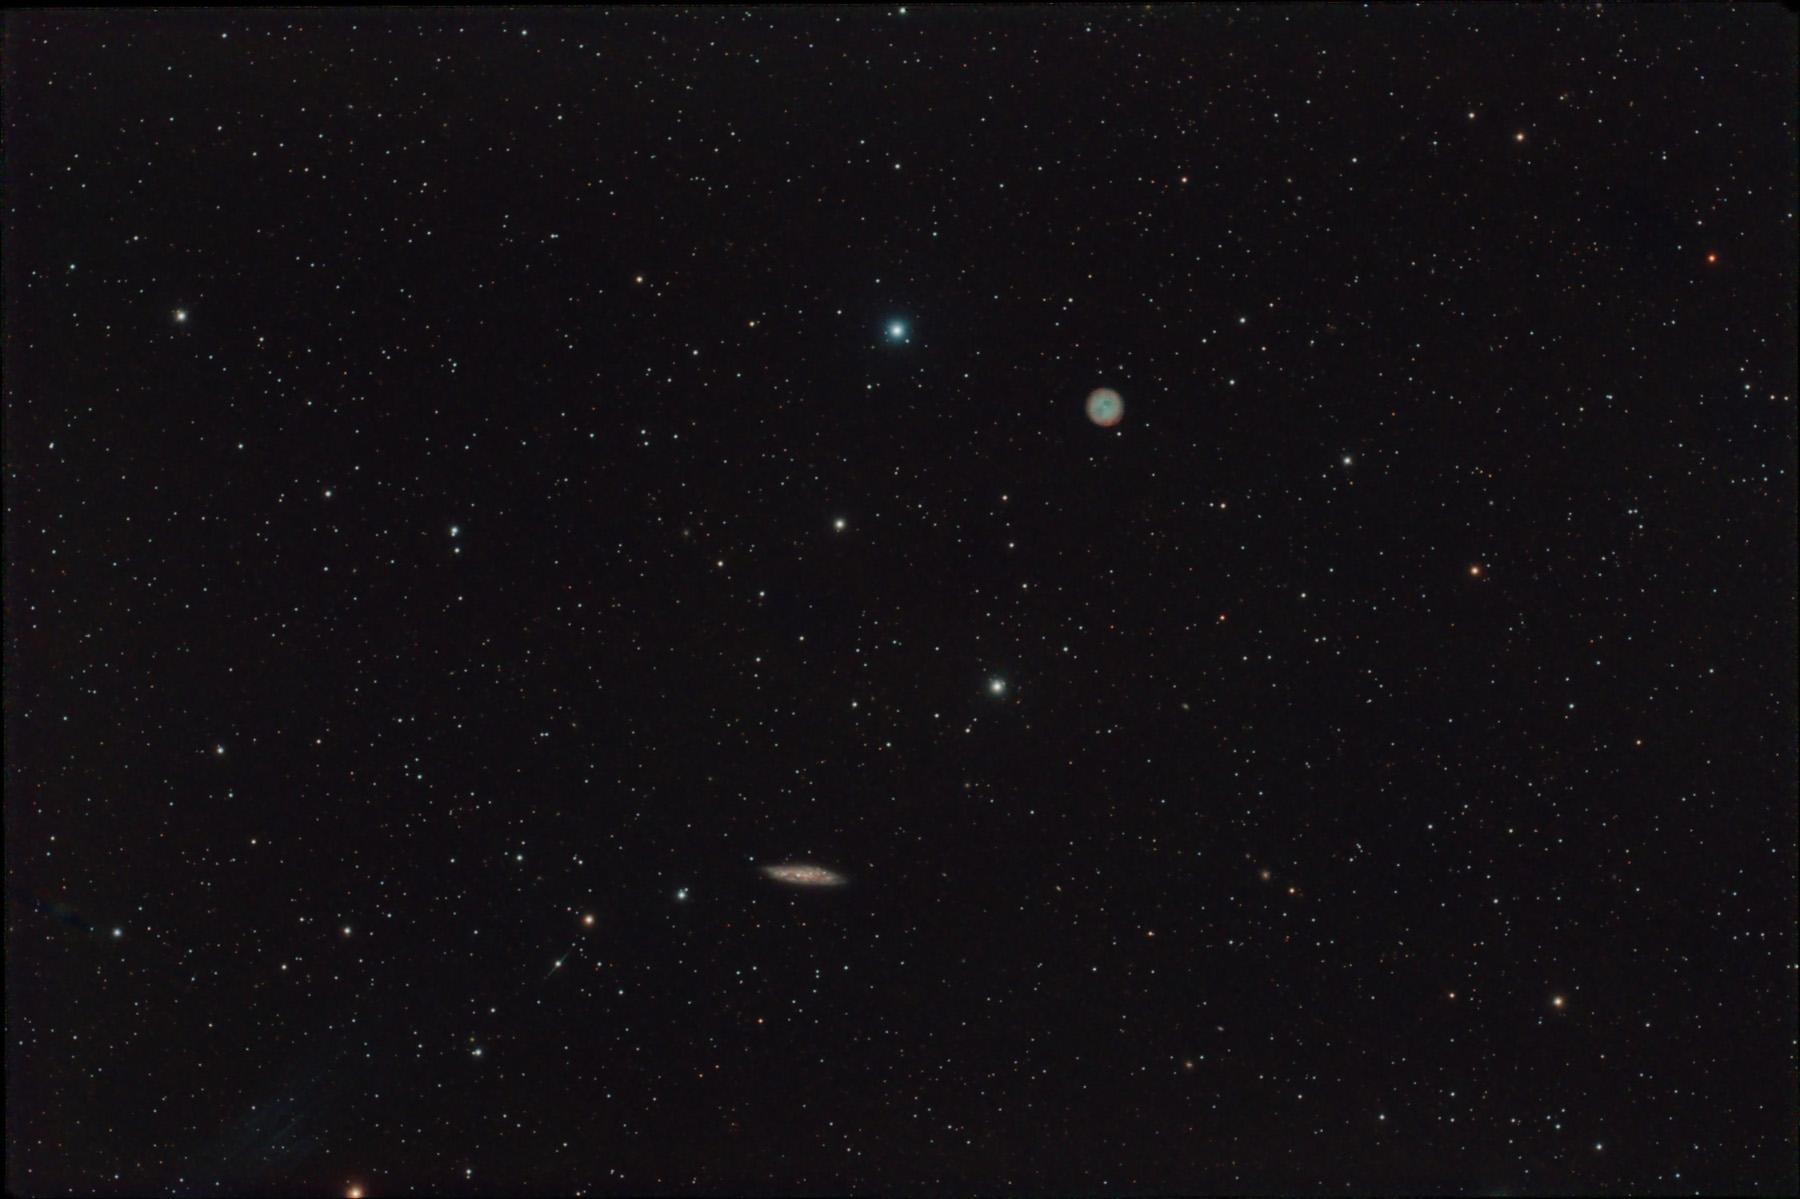 Nebulosa M97 i galàxia M108